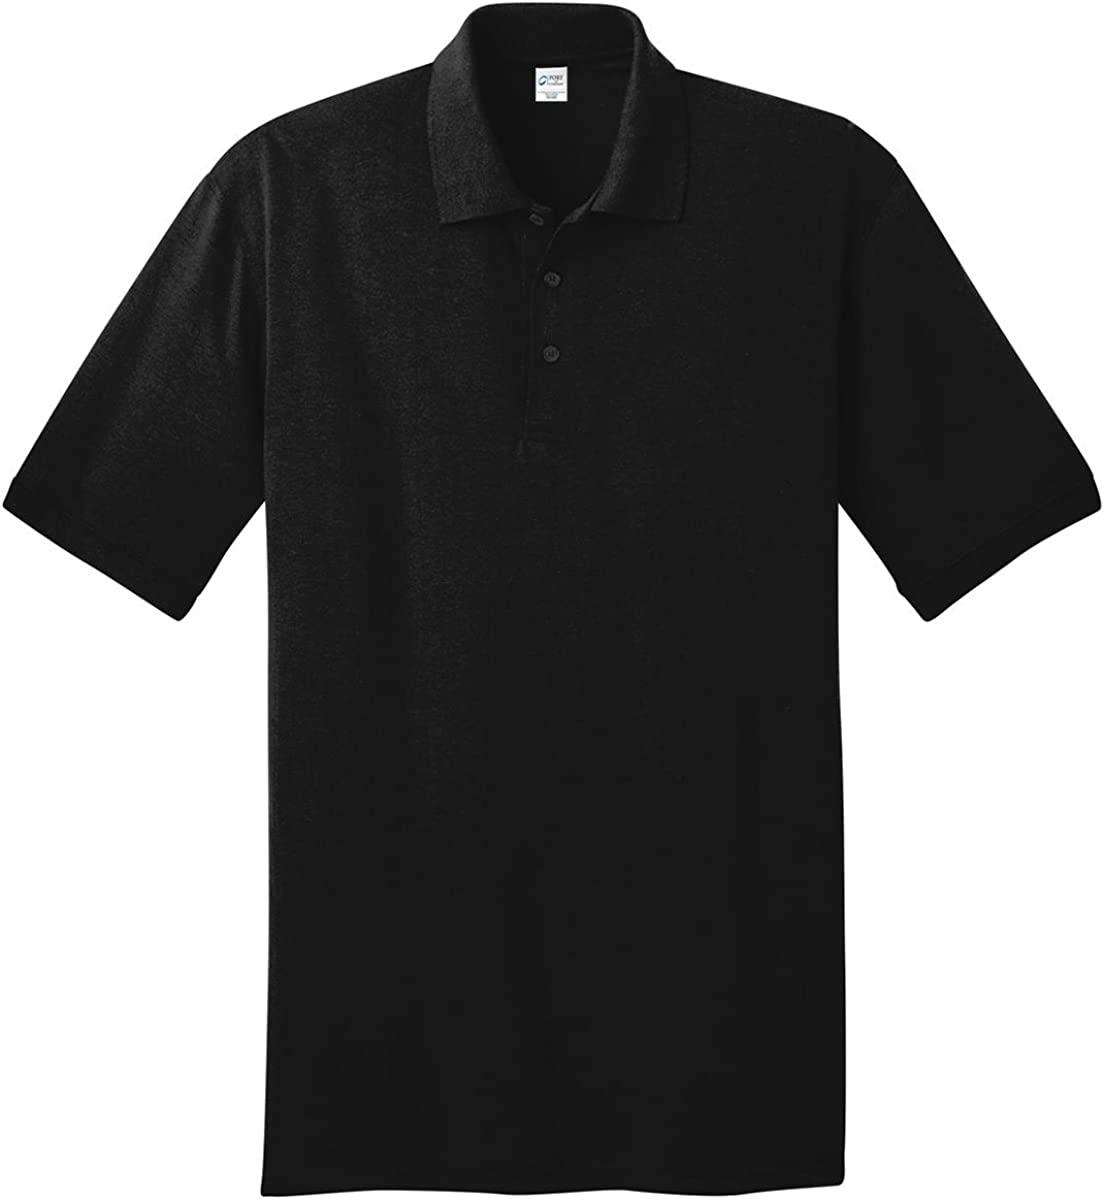 Port & Company Tall 5.5-Ounce Jersey Knit Polo Shirt, Jet Black, Large Tall